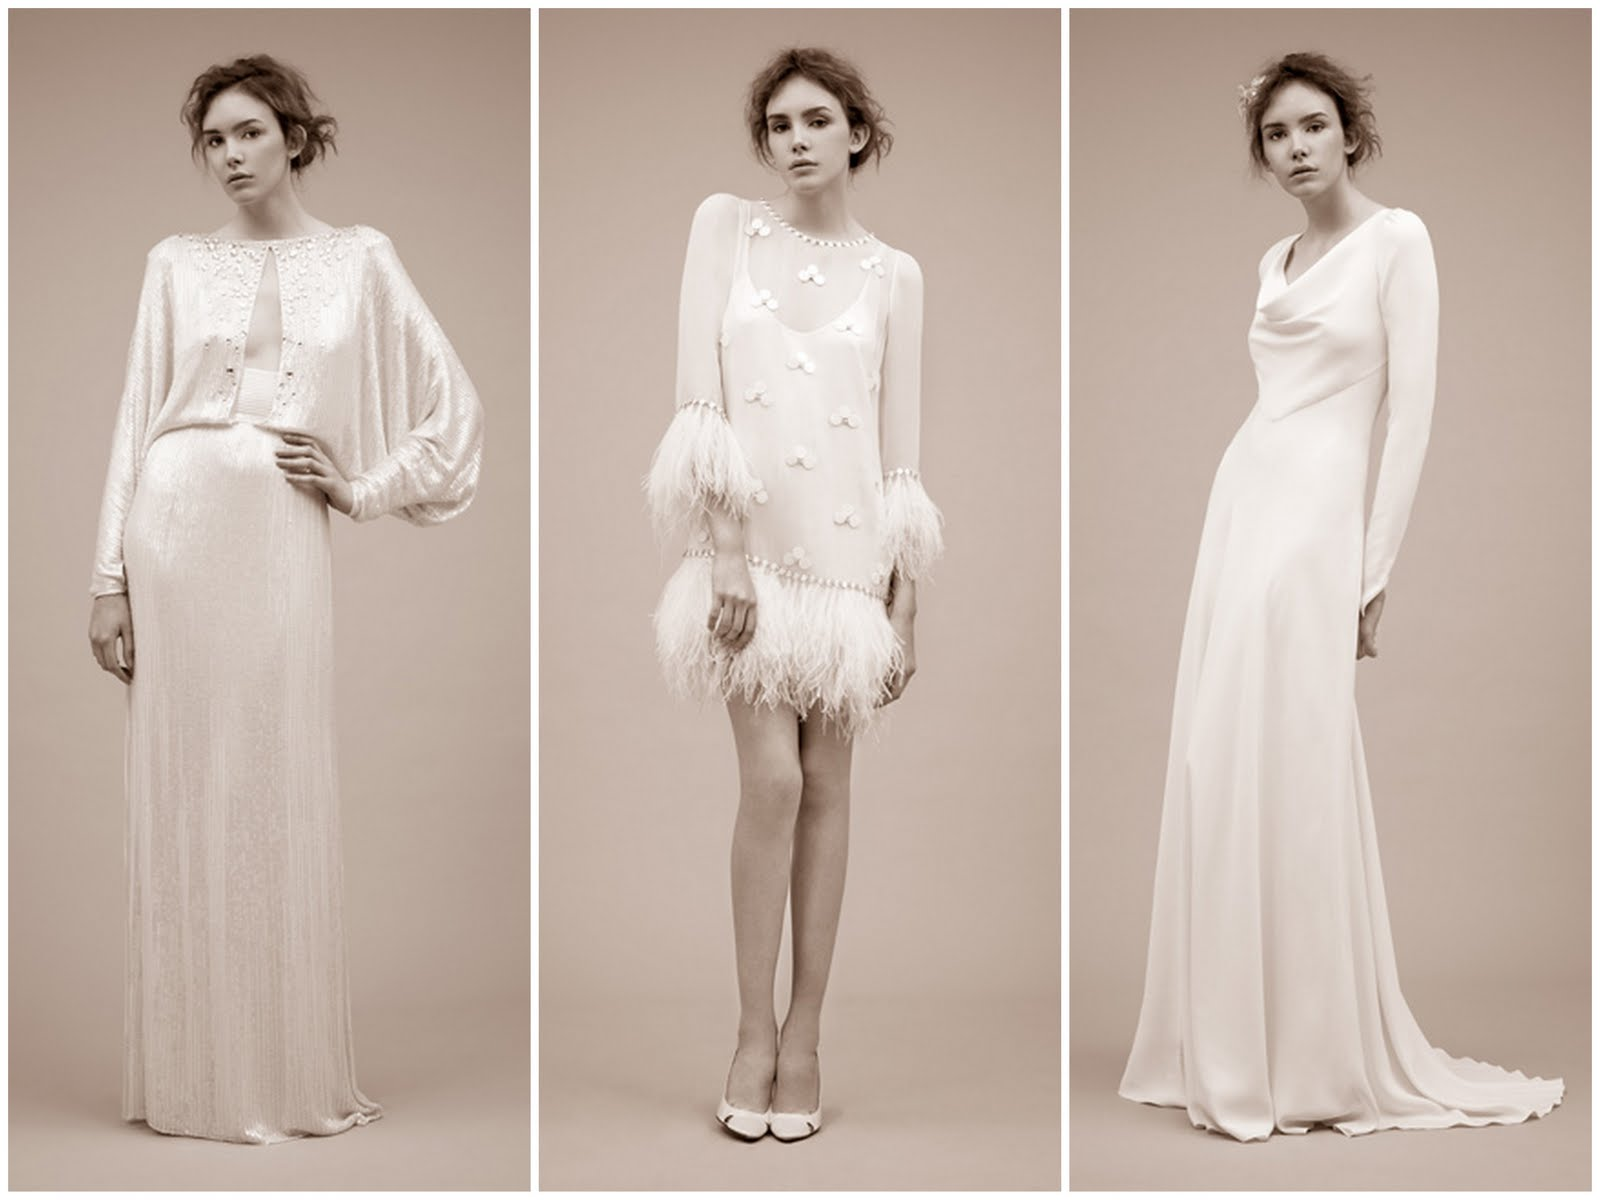 top long sleeved wedding dresses sleeved wedding dress Long Sleeved Wedding Dresses from Jenny Packham Antonella Dido Yevonde